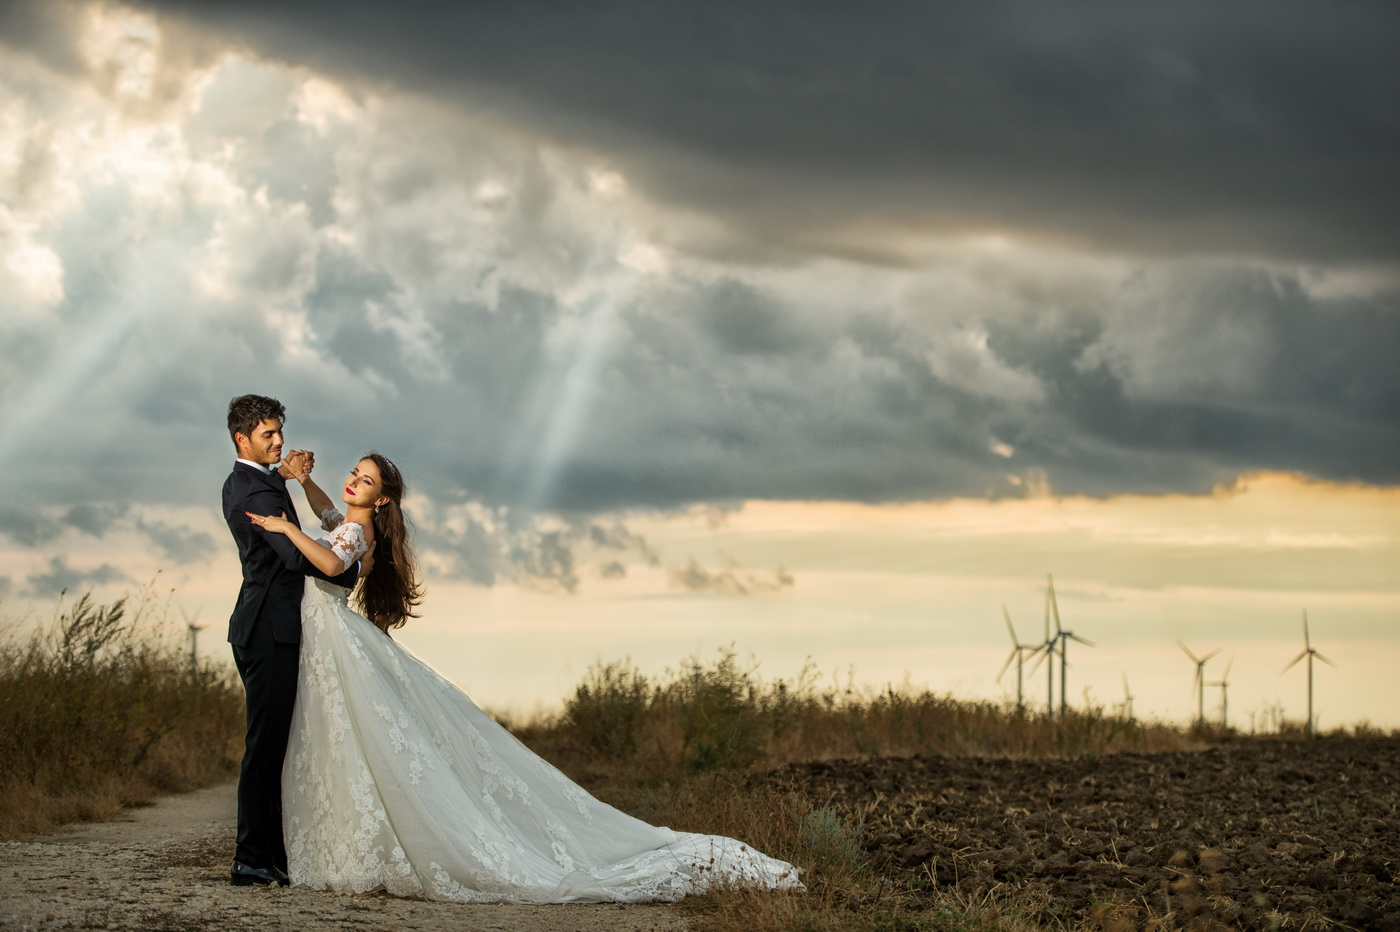 Destination Wedding Photographer_Marian Sterea_126.jpg